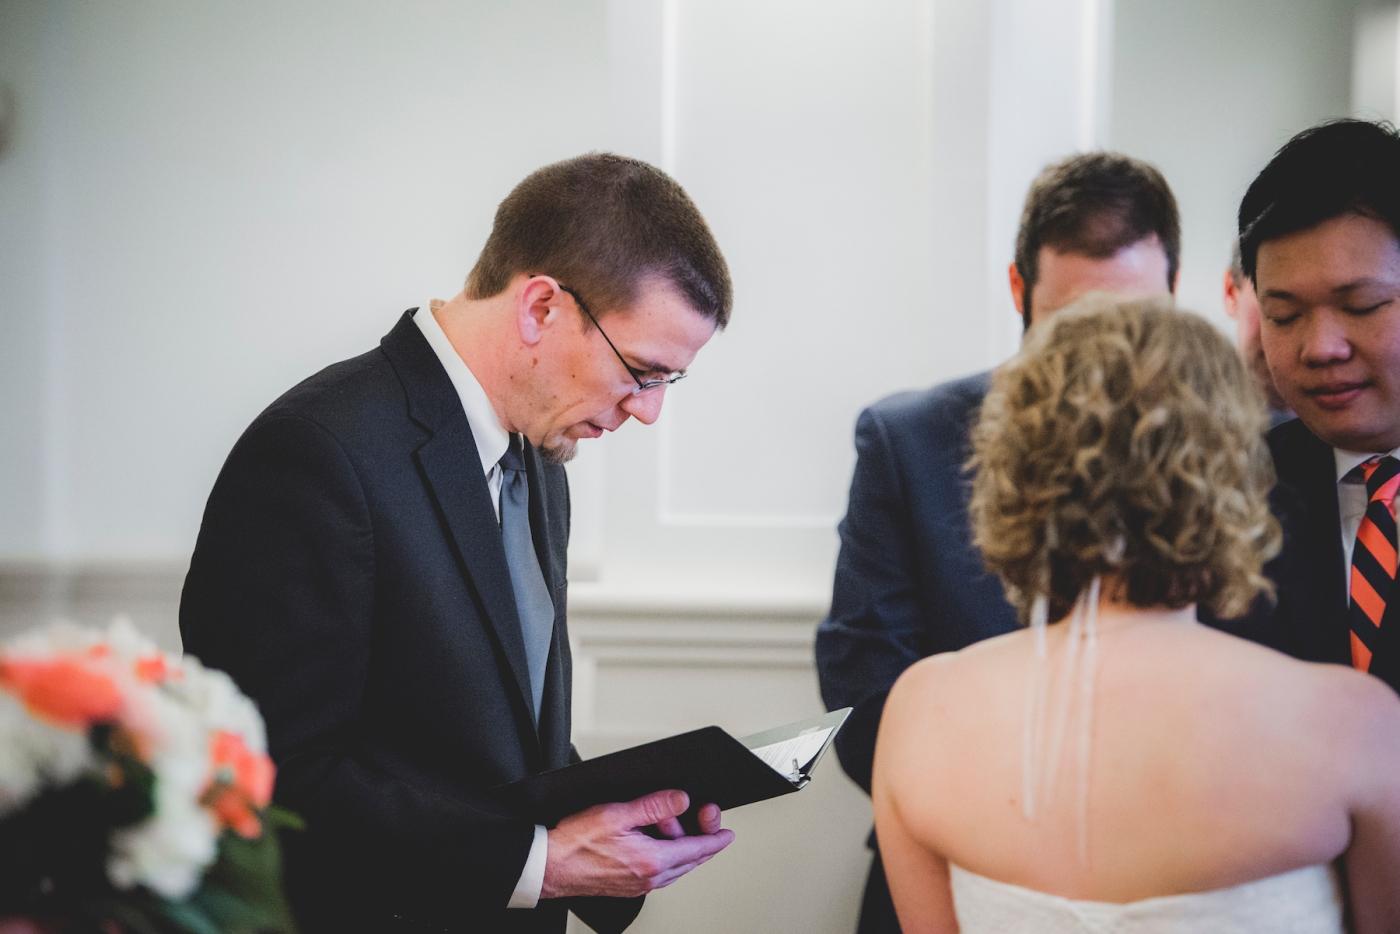 DSC_2585Everett_Wedding_Ballroom_Jane_Speleers_photography_Rachel_and_Edmund_Ceremony_2017